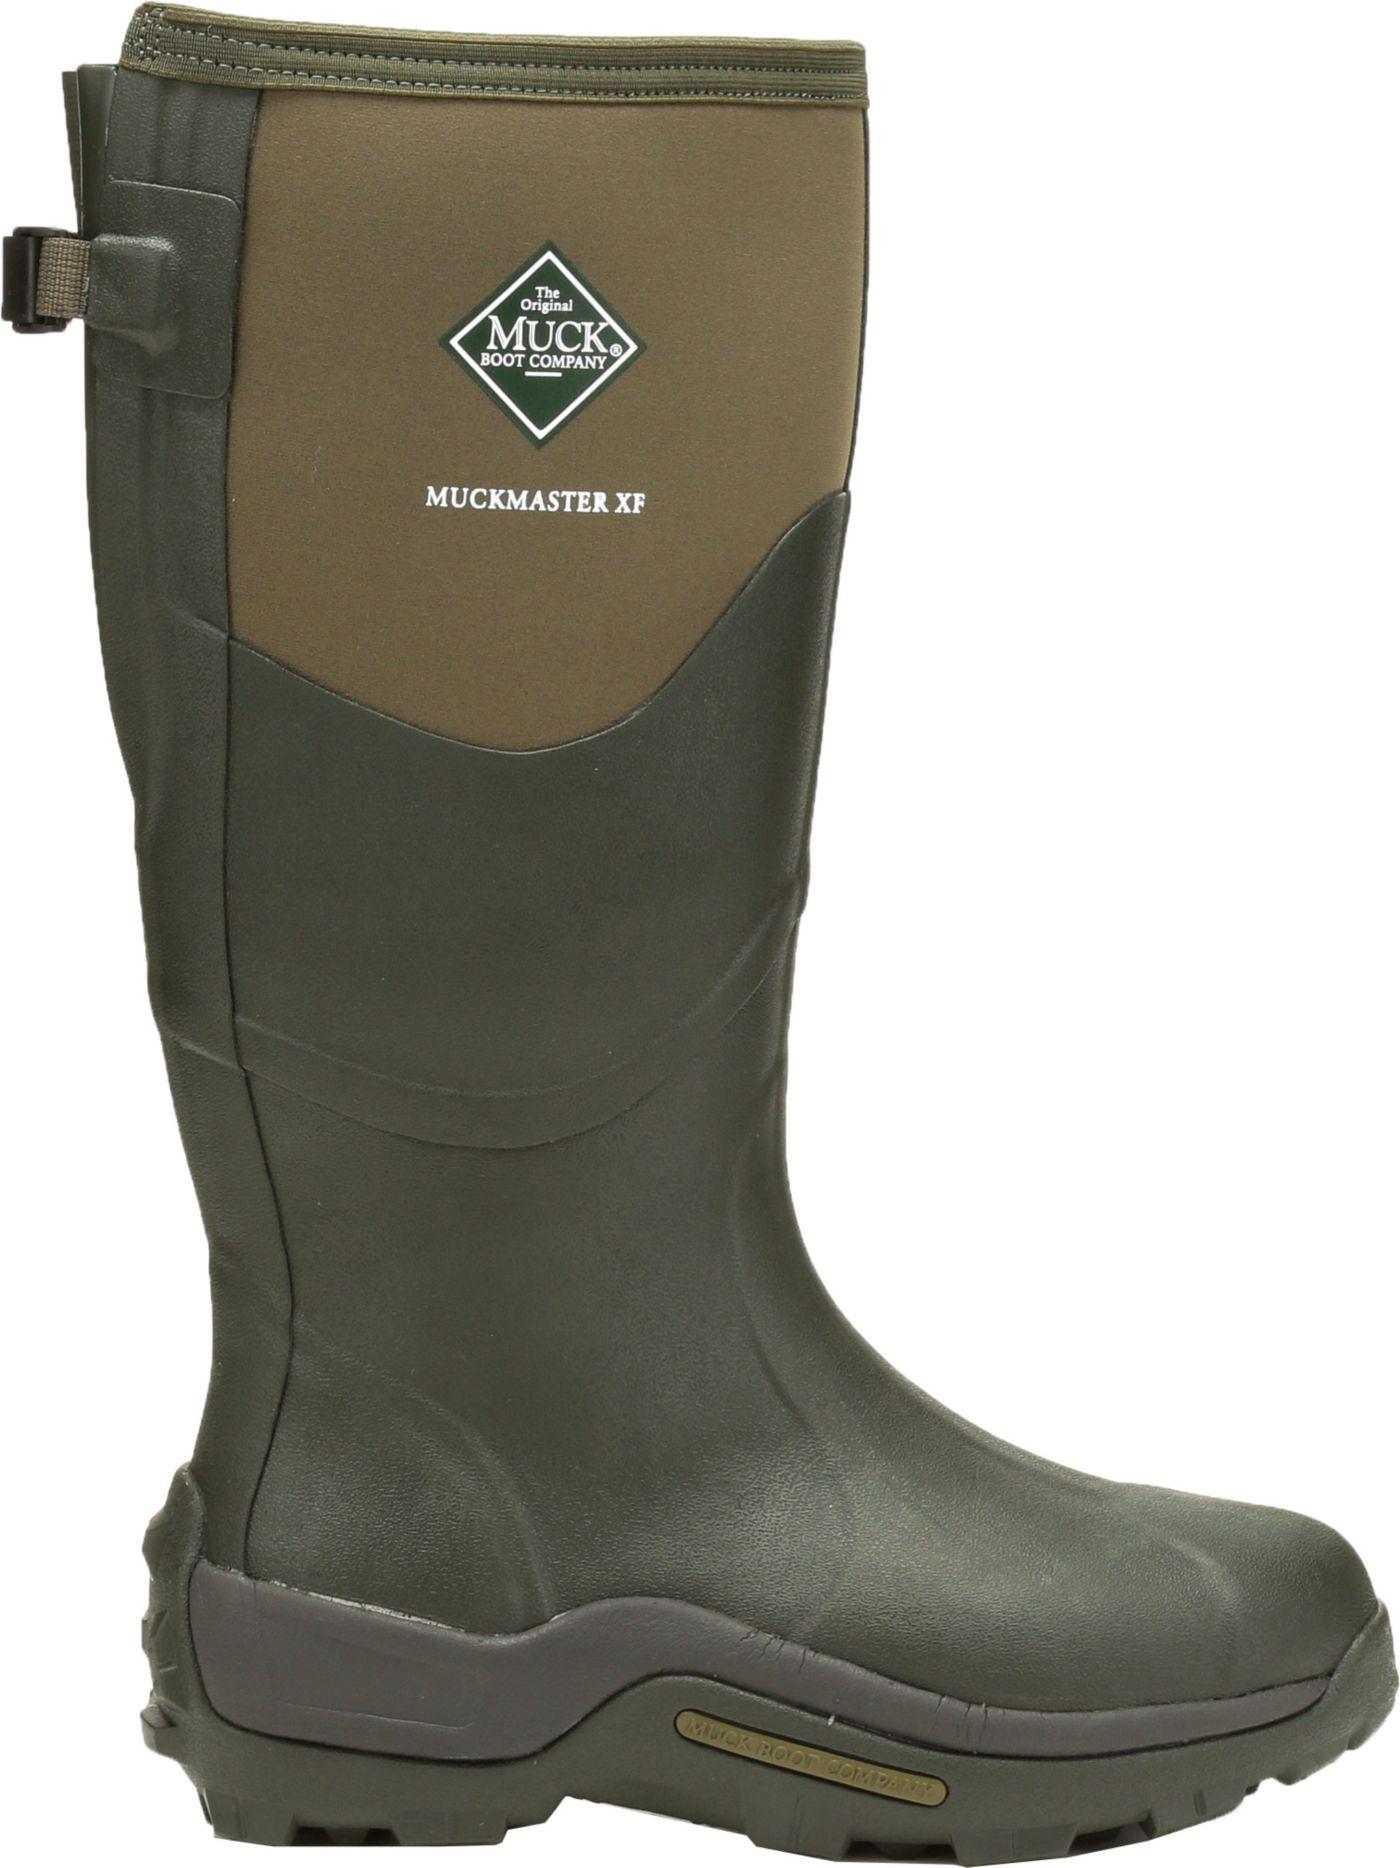 Muck Boots Men's Muckmaster Extended Fit Waterproof Work Boots